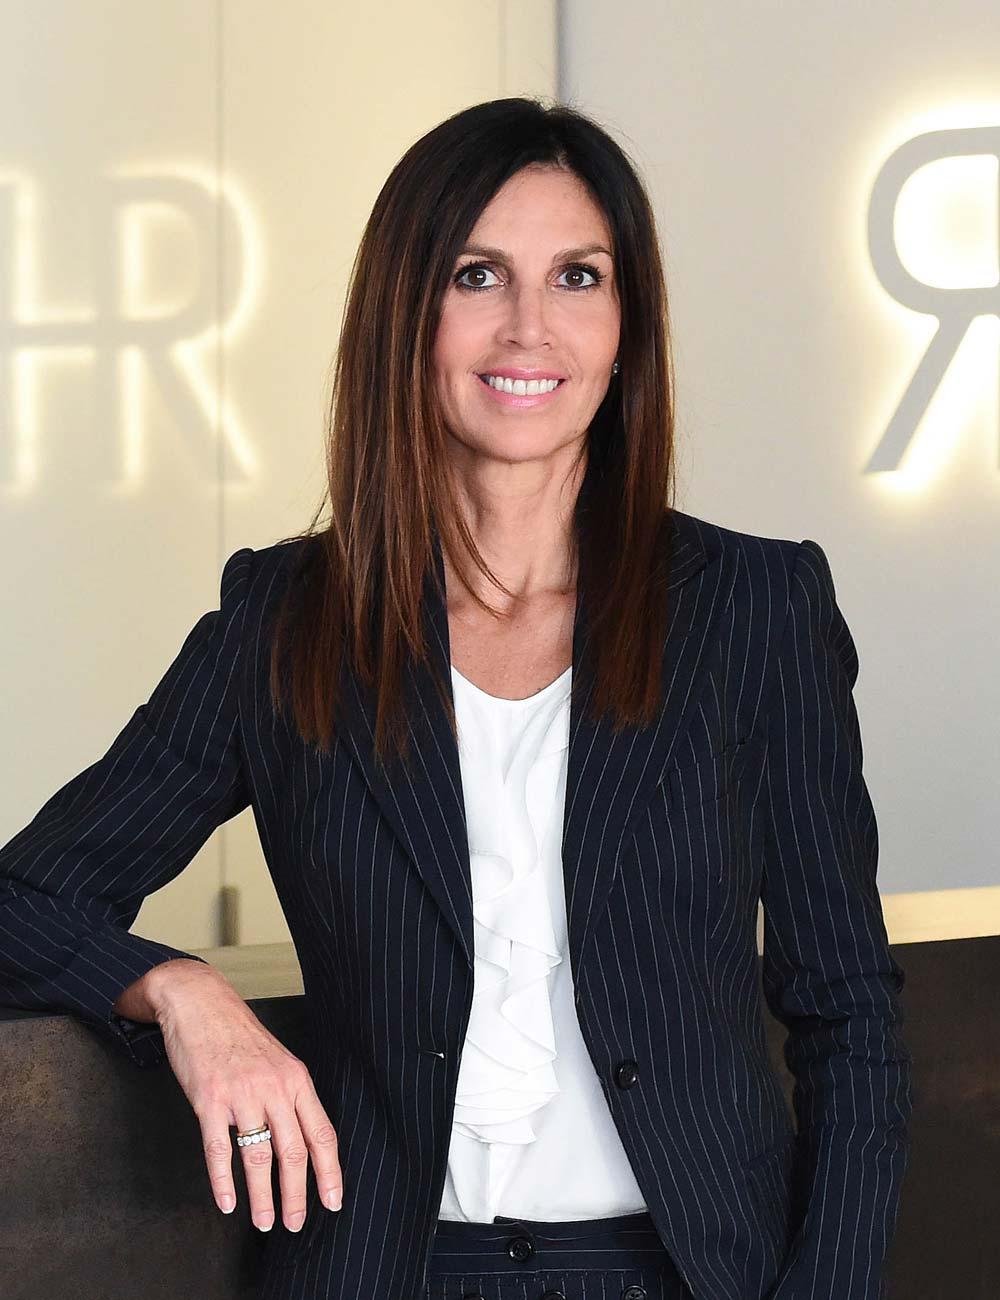 Dr. med. Irini Rohrbach - Augenärztin